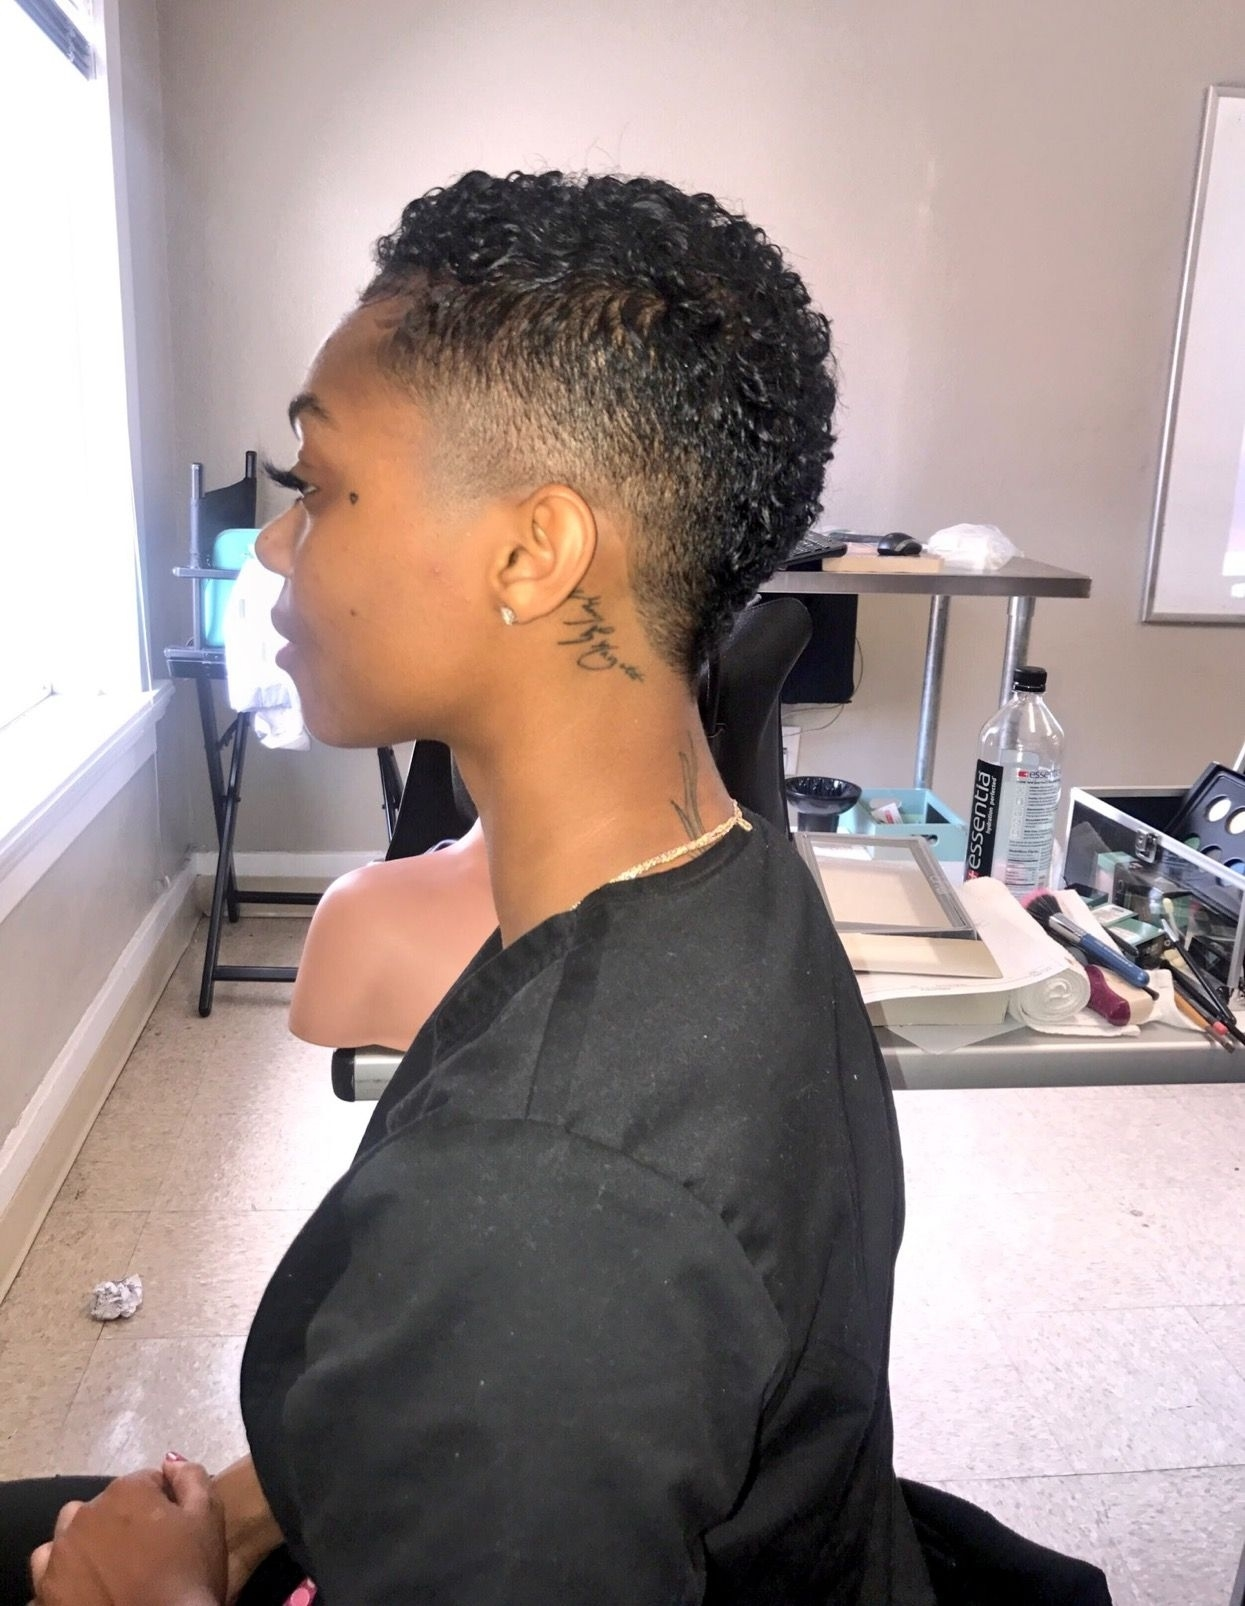 black women fade cut in back of hair style - wavy haircut